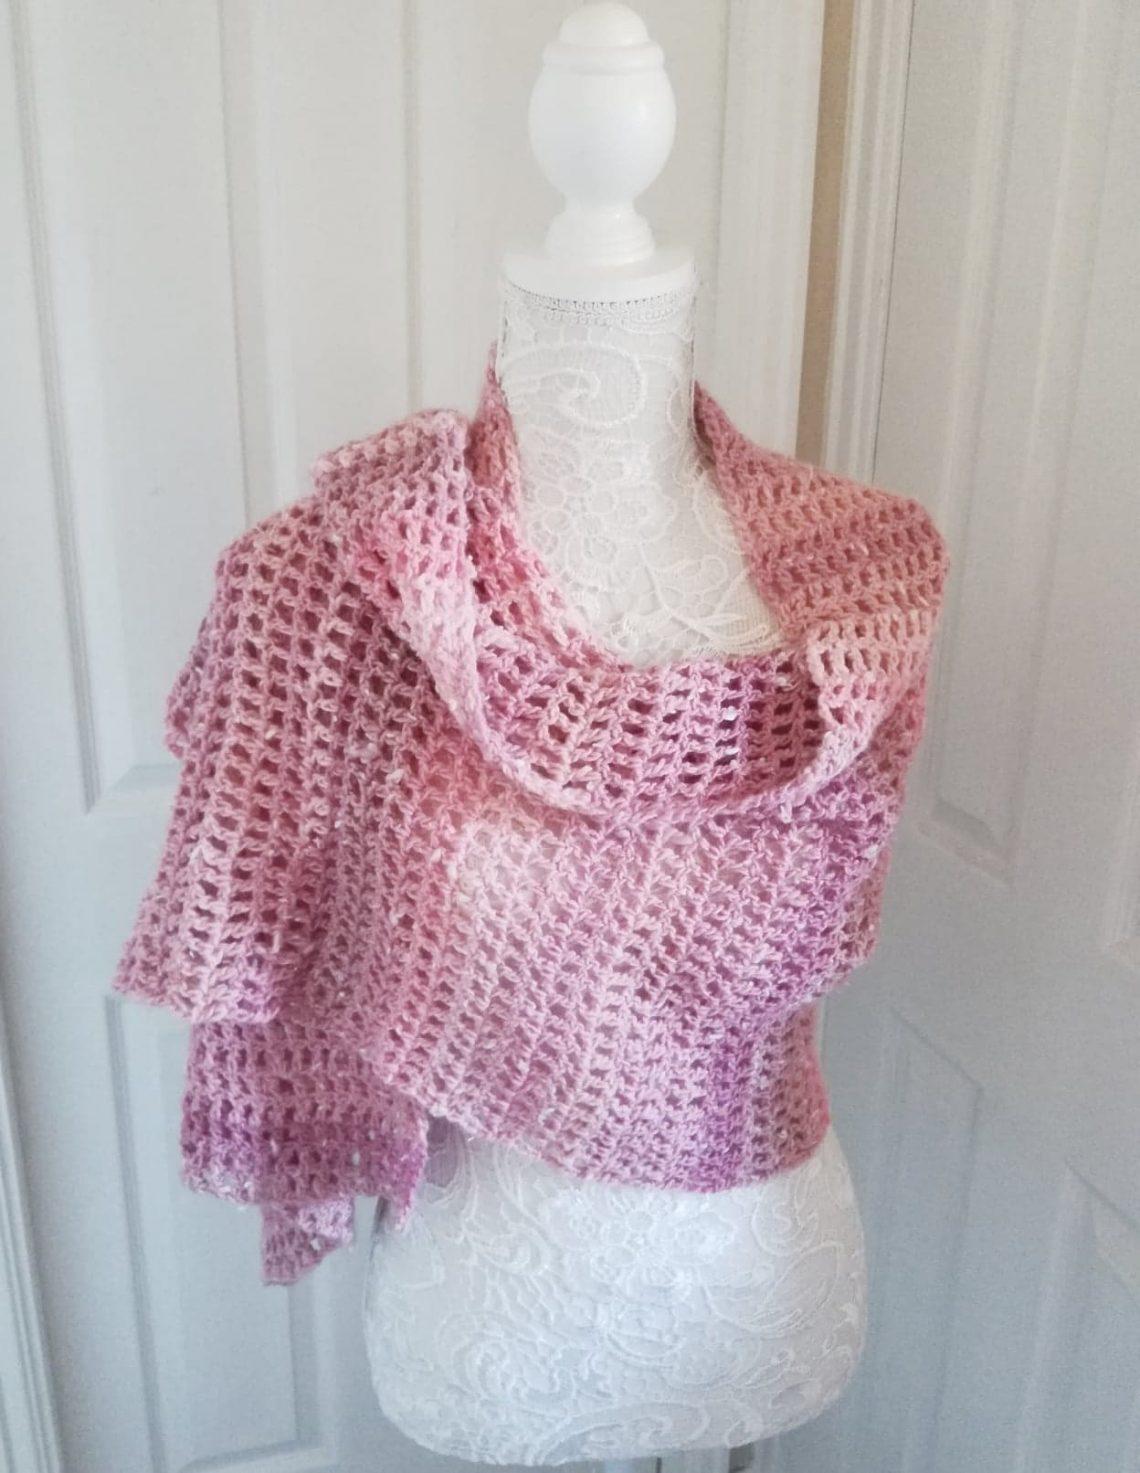 Crochet La Vie en Rose Wrap